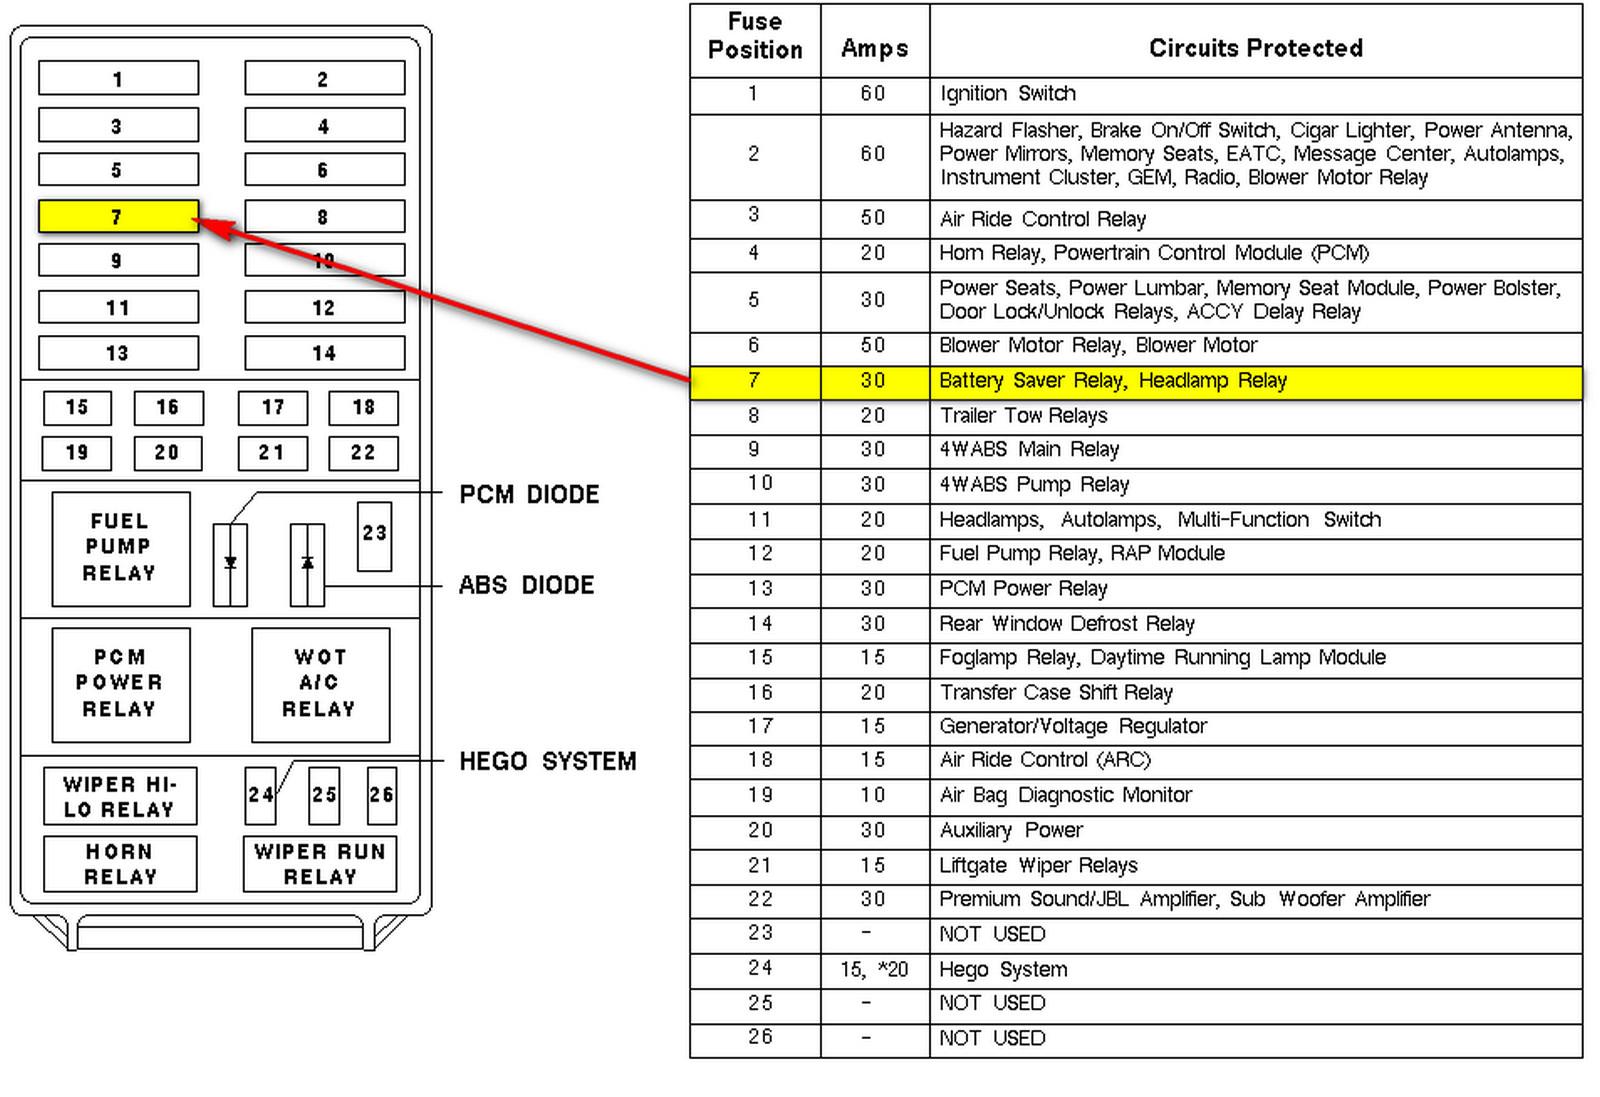 Tremendous H8Qtb Ford Relay Wiring Diagram Basic Electronics Wiring Diagram Wiring Cloud Dulfrecoveryedborg